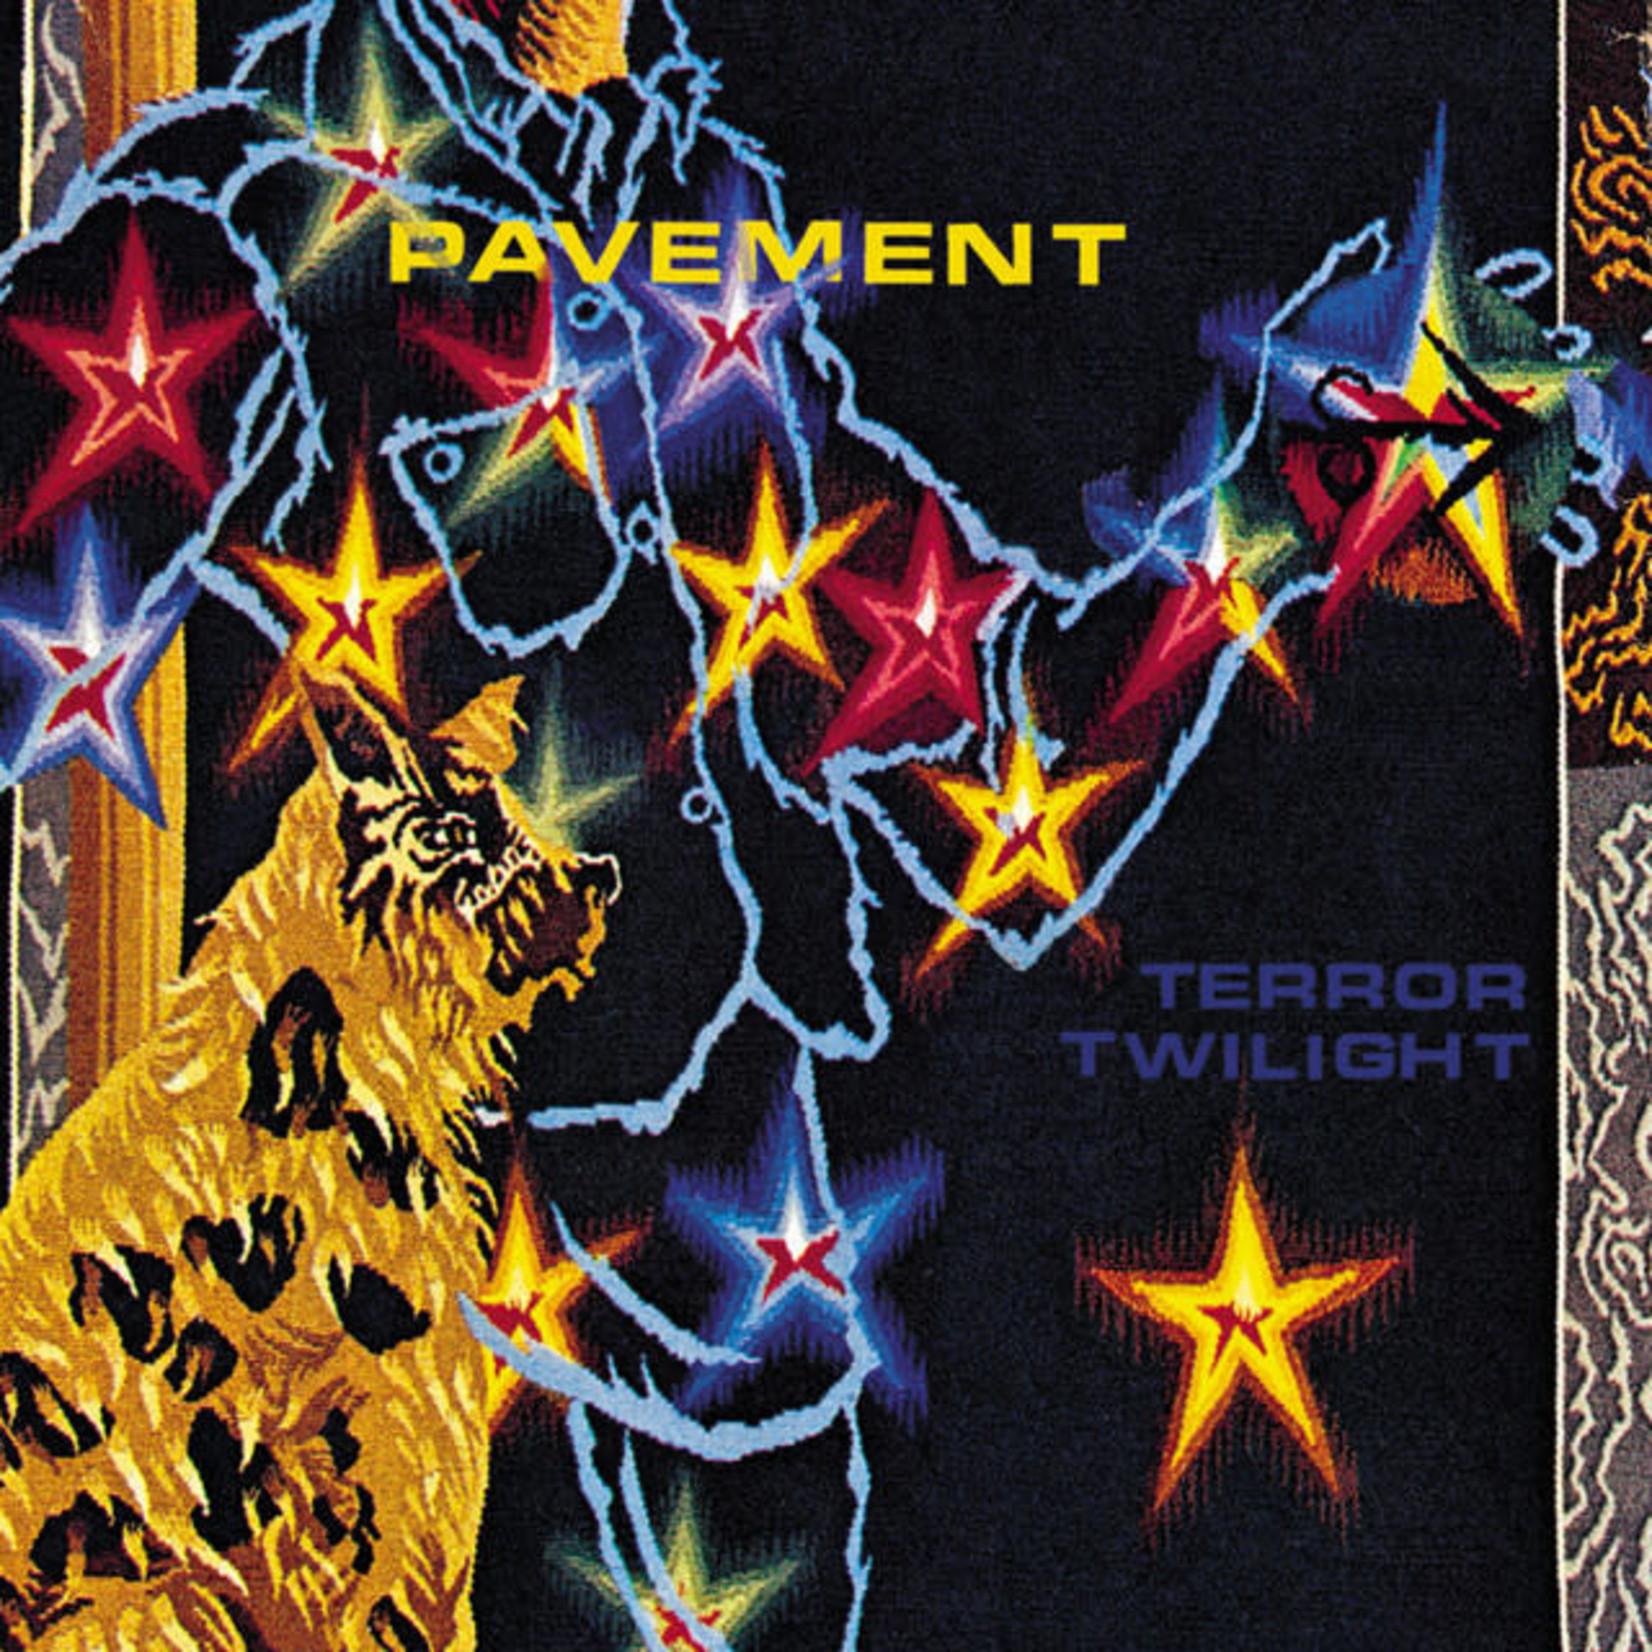 Vinyl Pavement - Terror Twilight